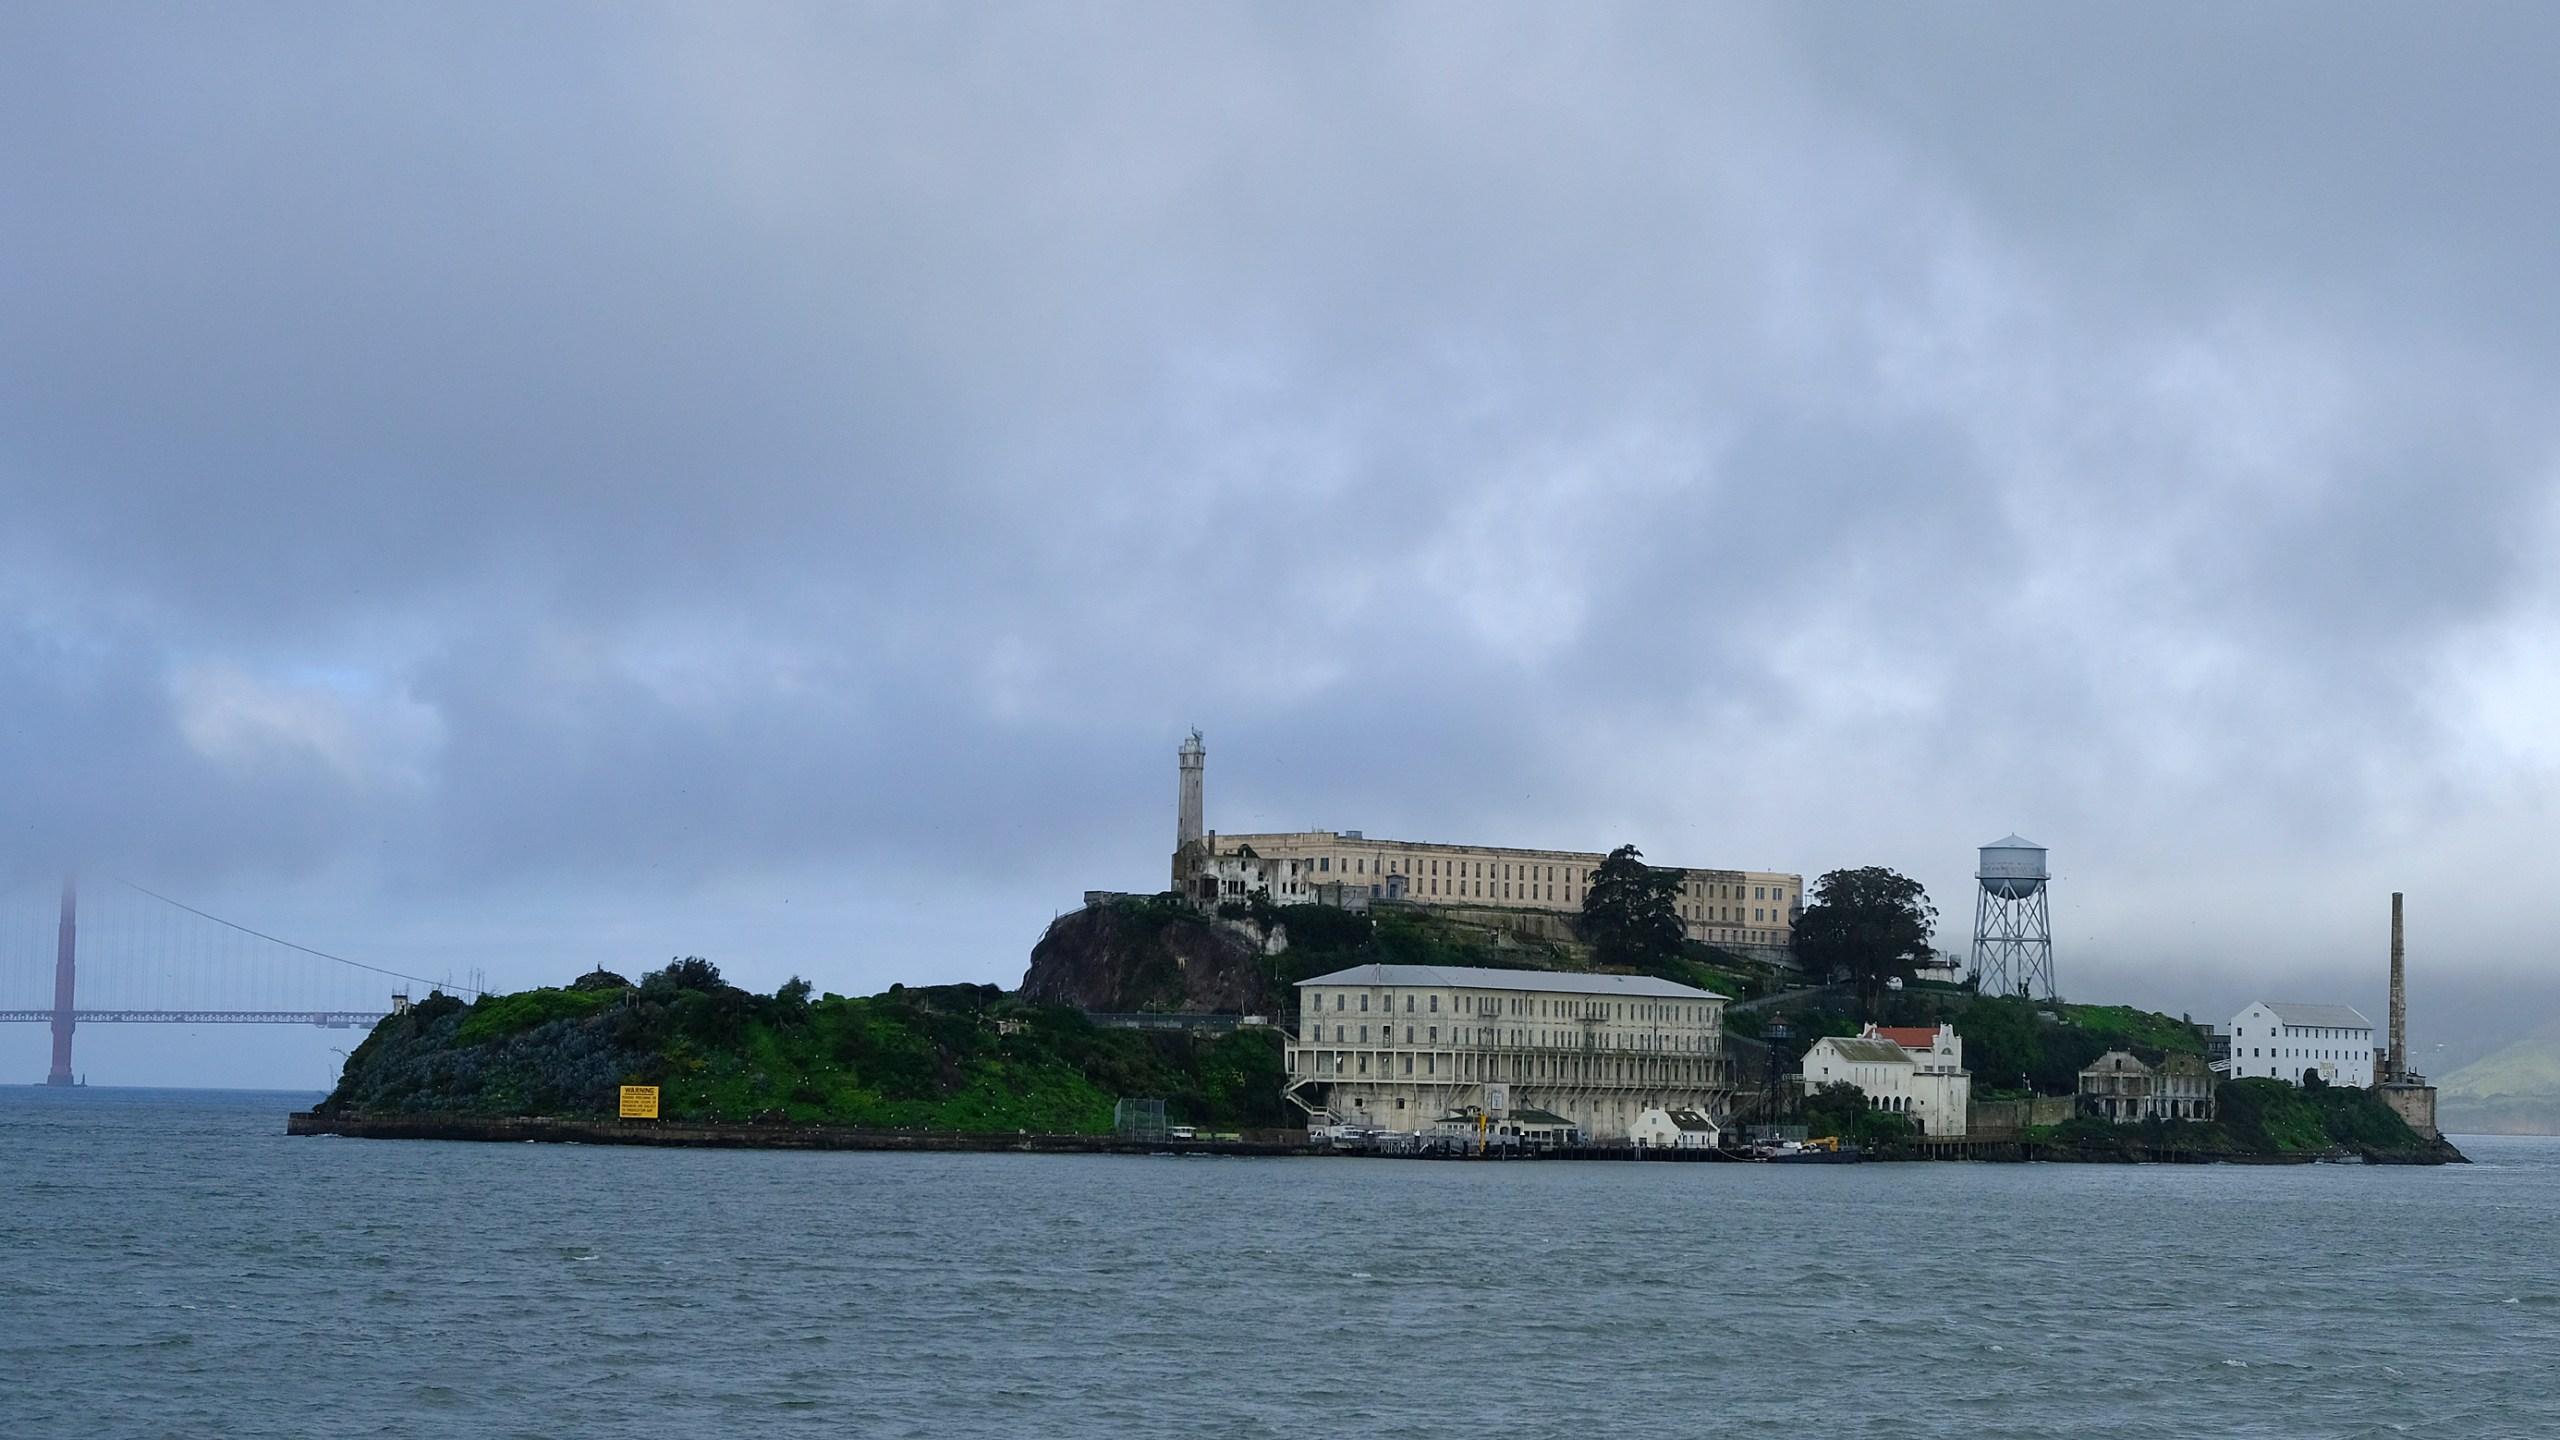 Alcatraz_Island_Tunnels_77501-159532.jpg25141416